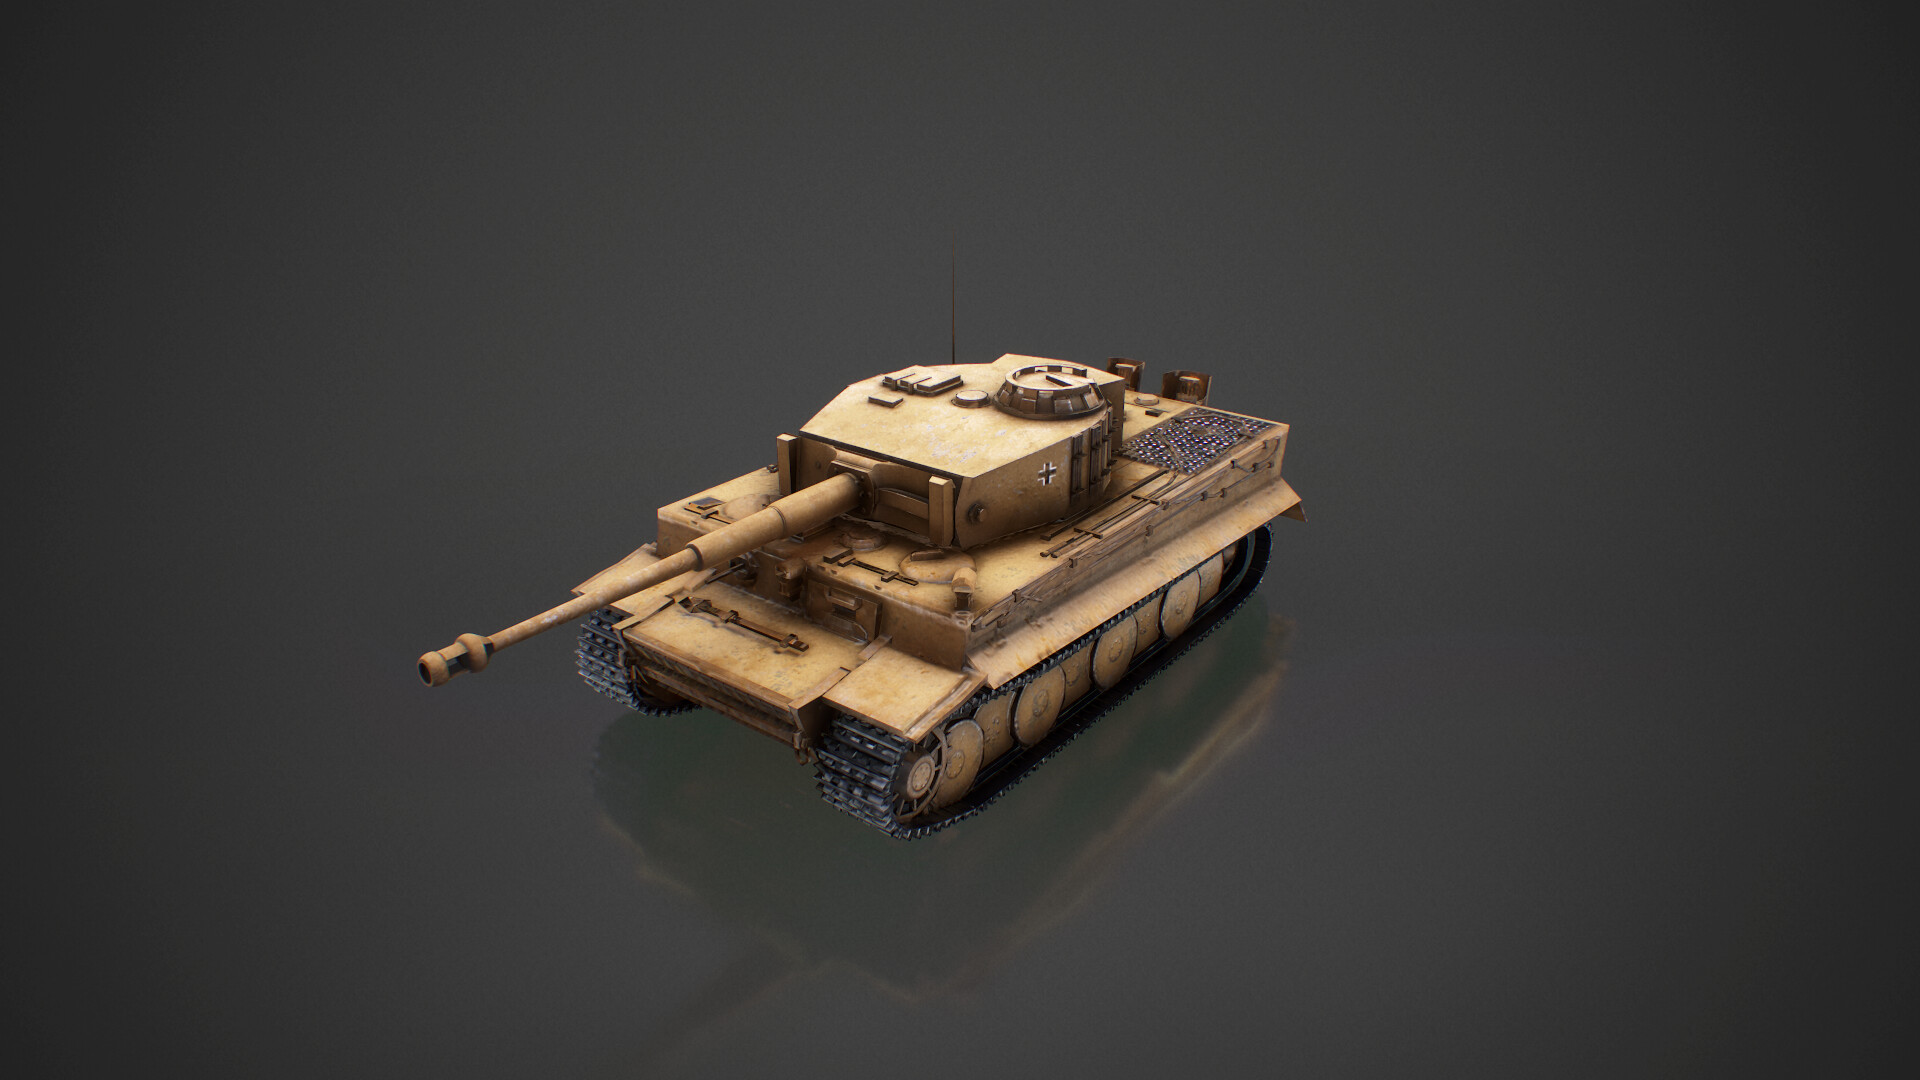 Artstation Panzerkampfwagen Vi Tiger 1 Ausfe Asier